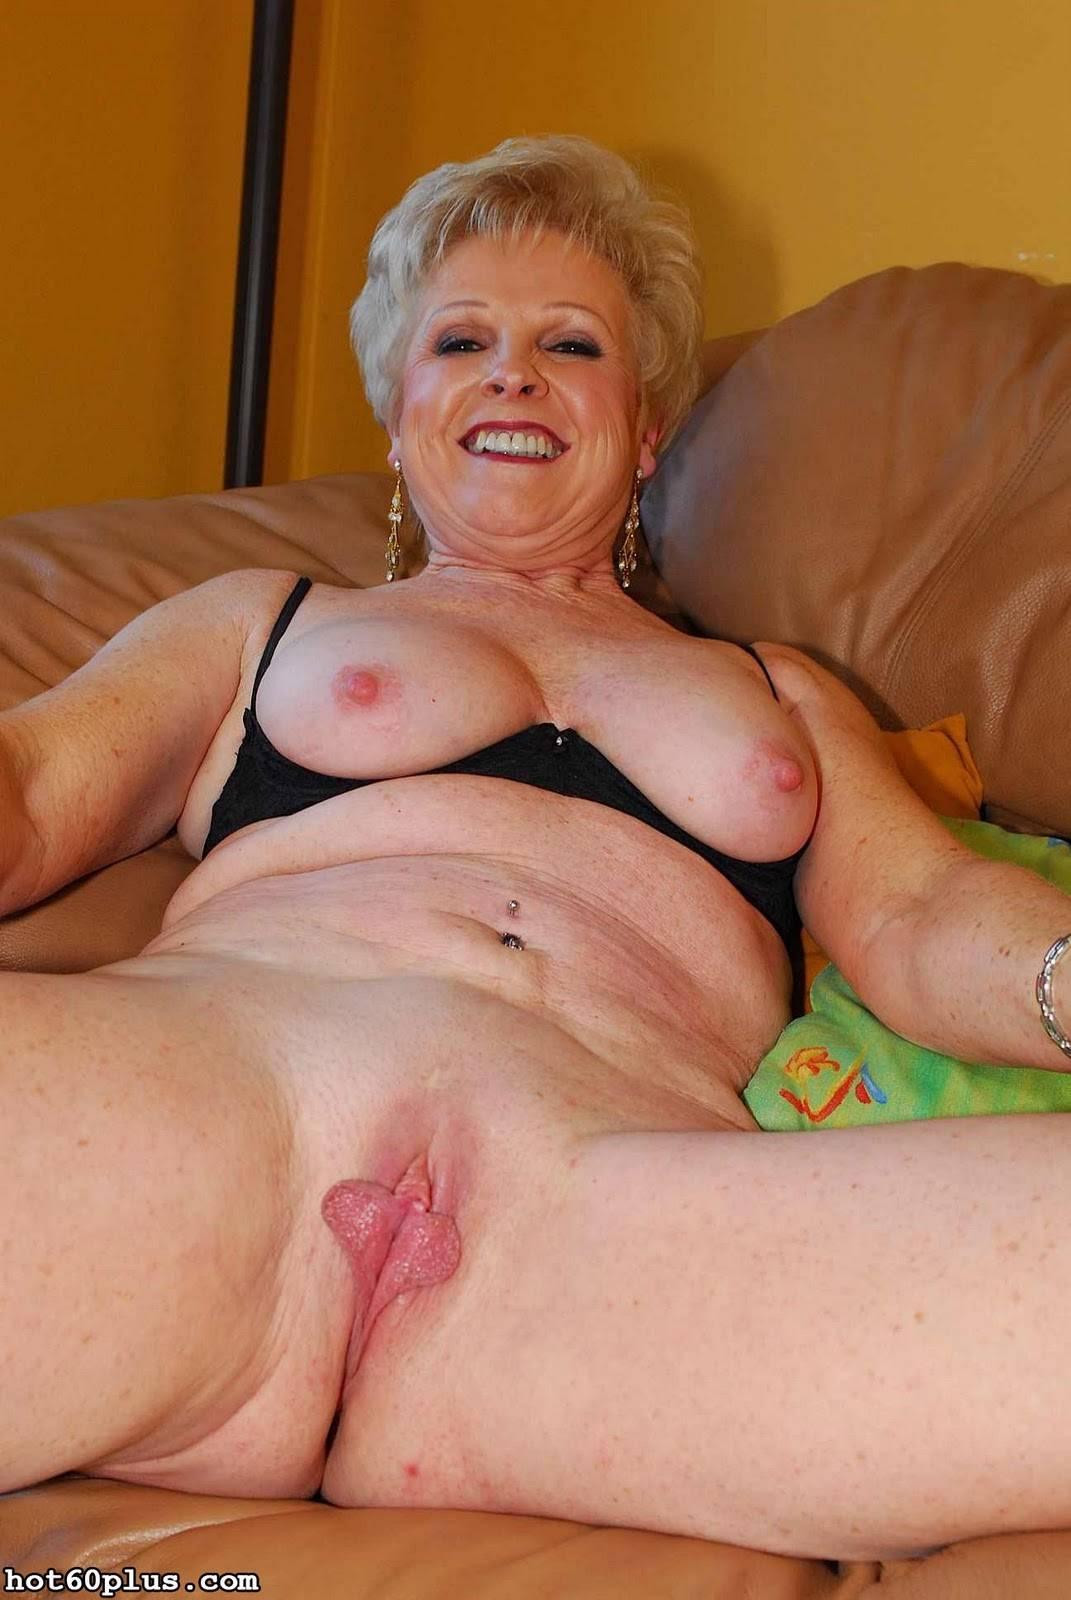 Grandma mature nude pics, women sex galleries